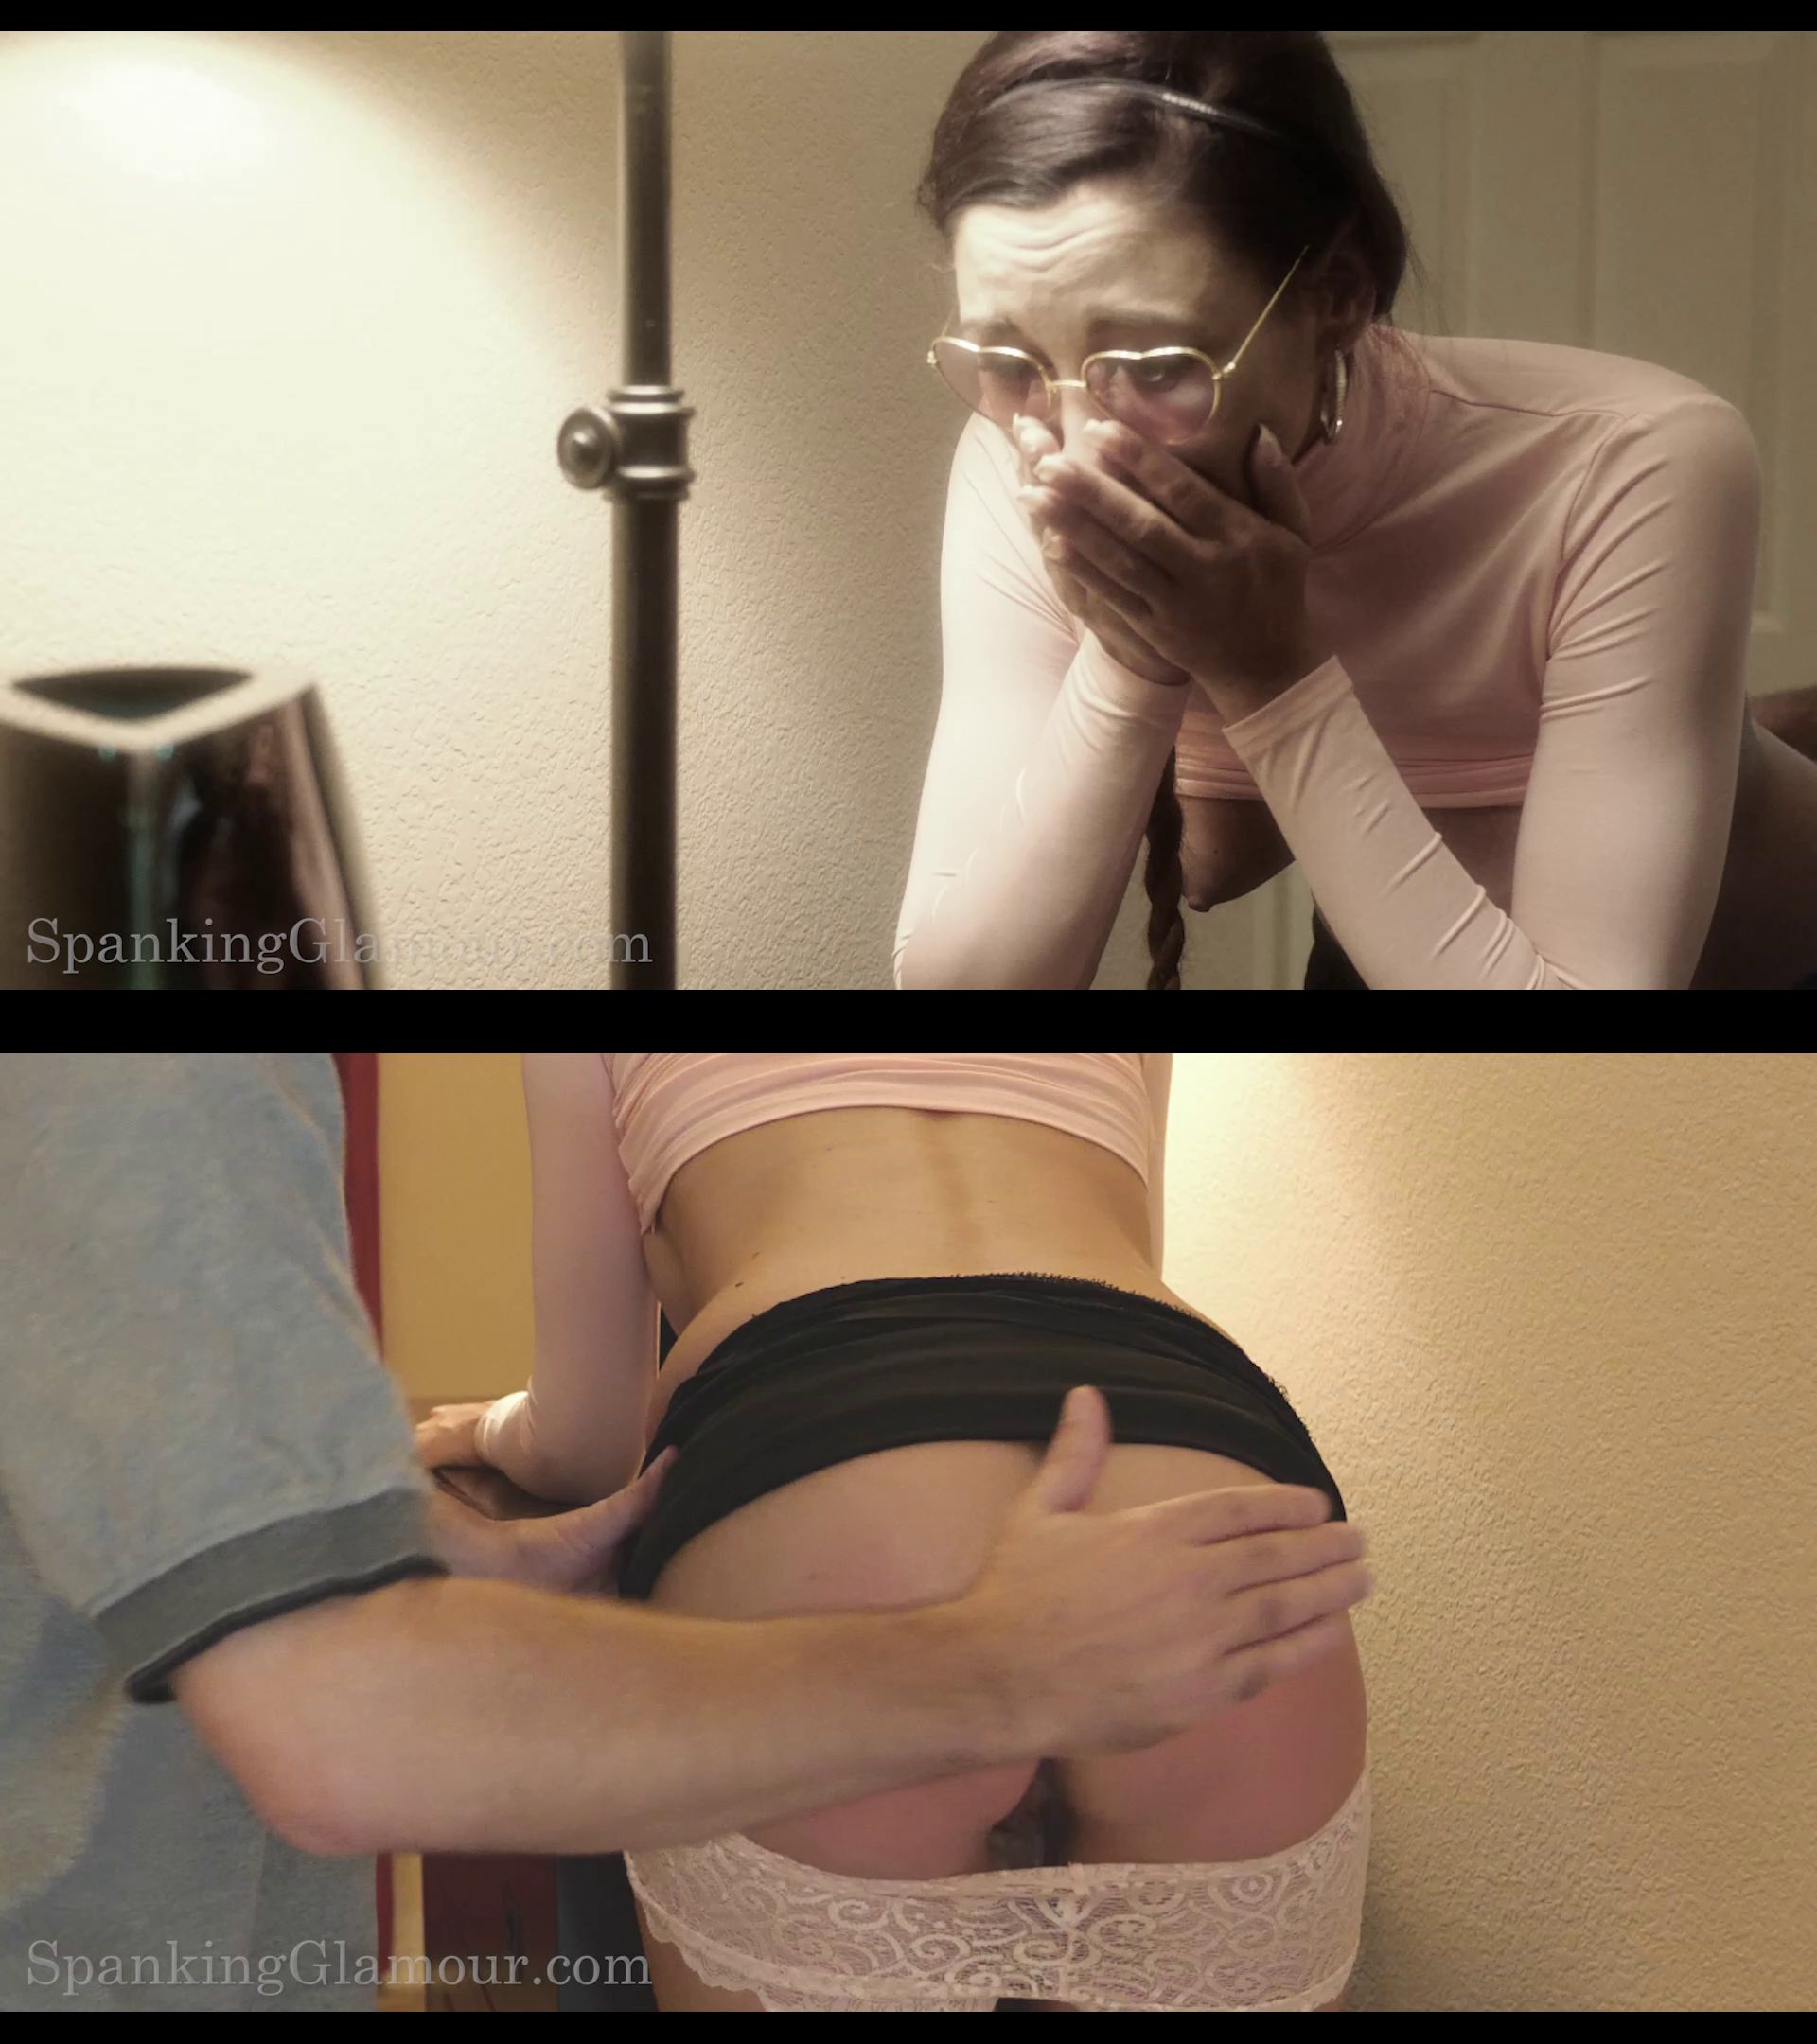 spankingglamor – MP4/HD – Artemisia Love – Artemisia Love 2